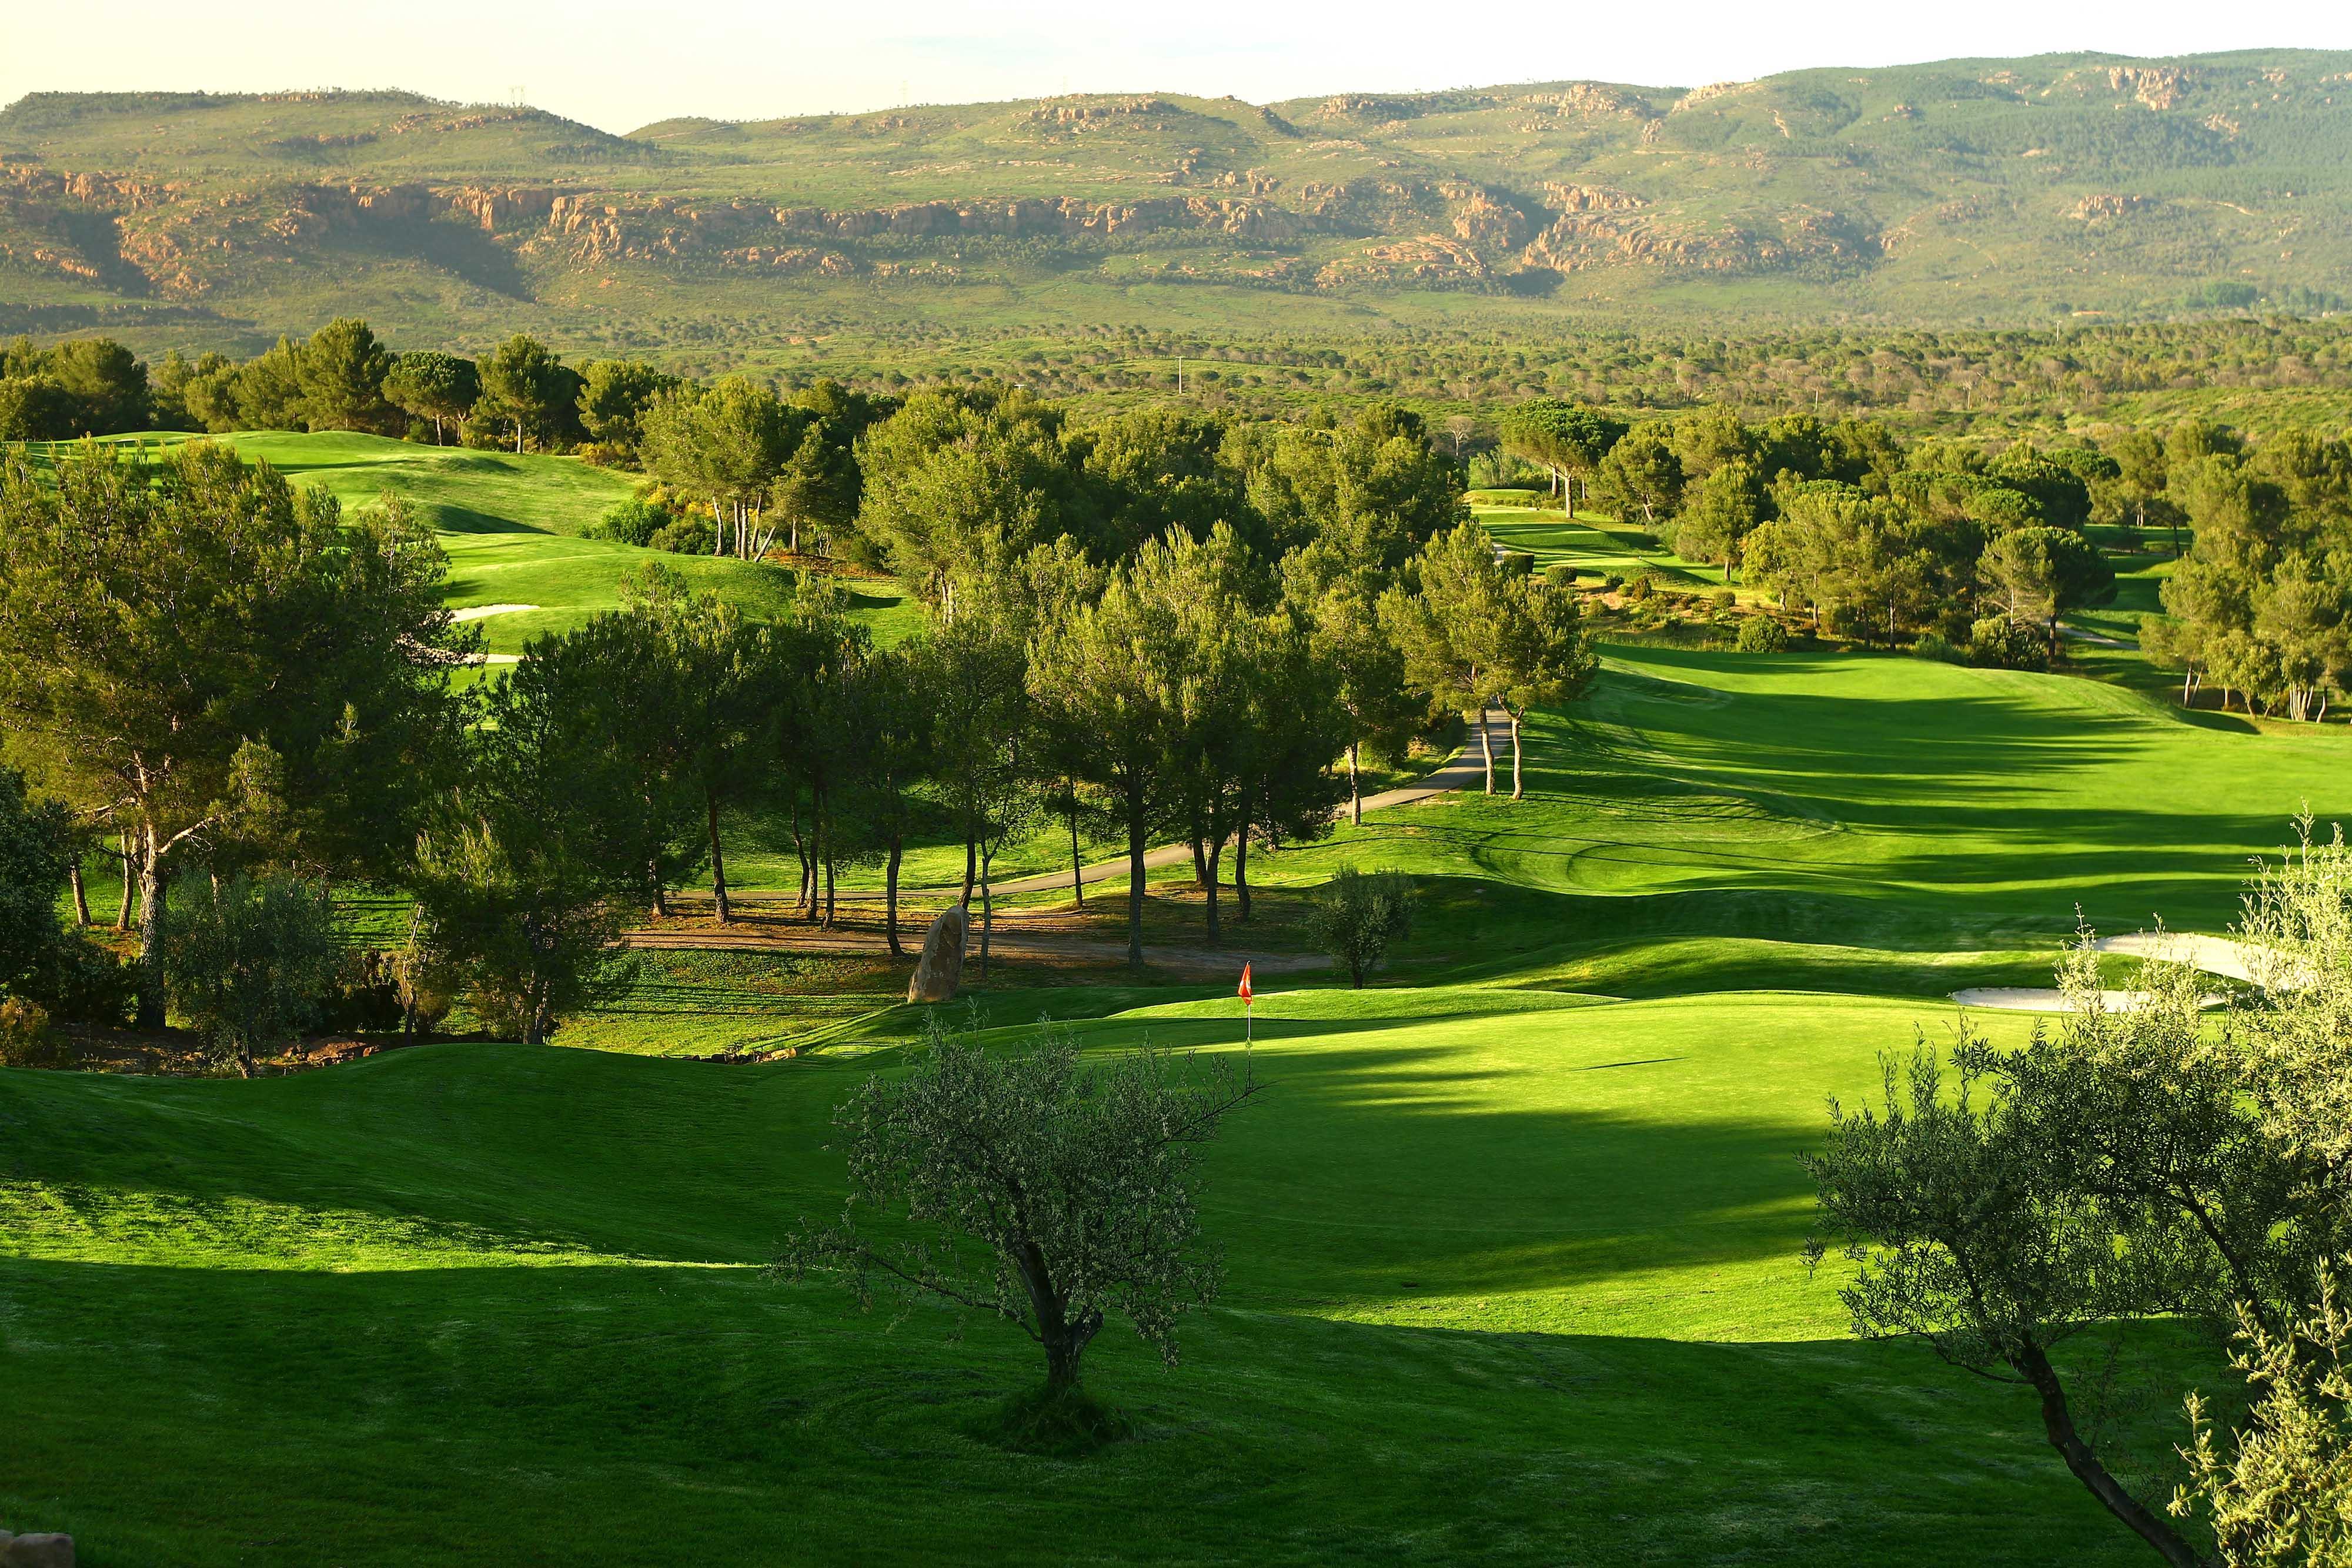 golf-expedition-golf-reizen-frankrijk-regio-cote-d'azur-Les-Domaines-de-Saint-Endréol-Golf-en-Spa-Resort-golfbaan-fairway